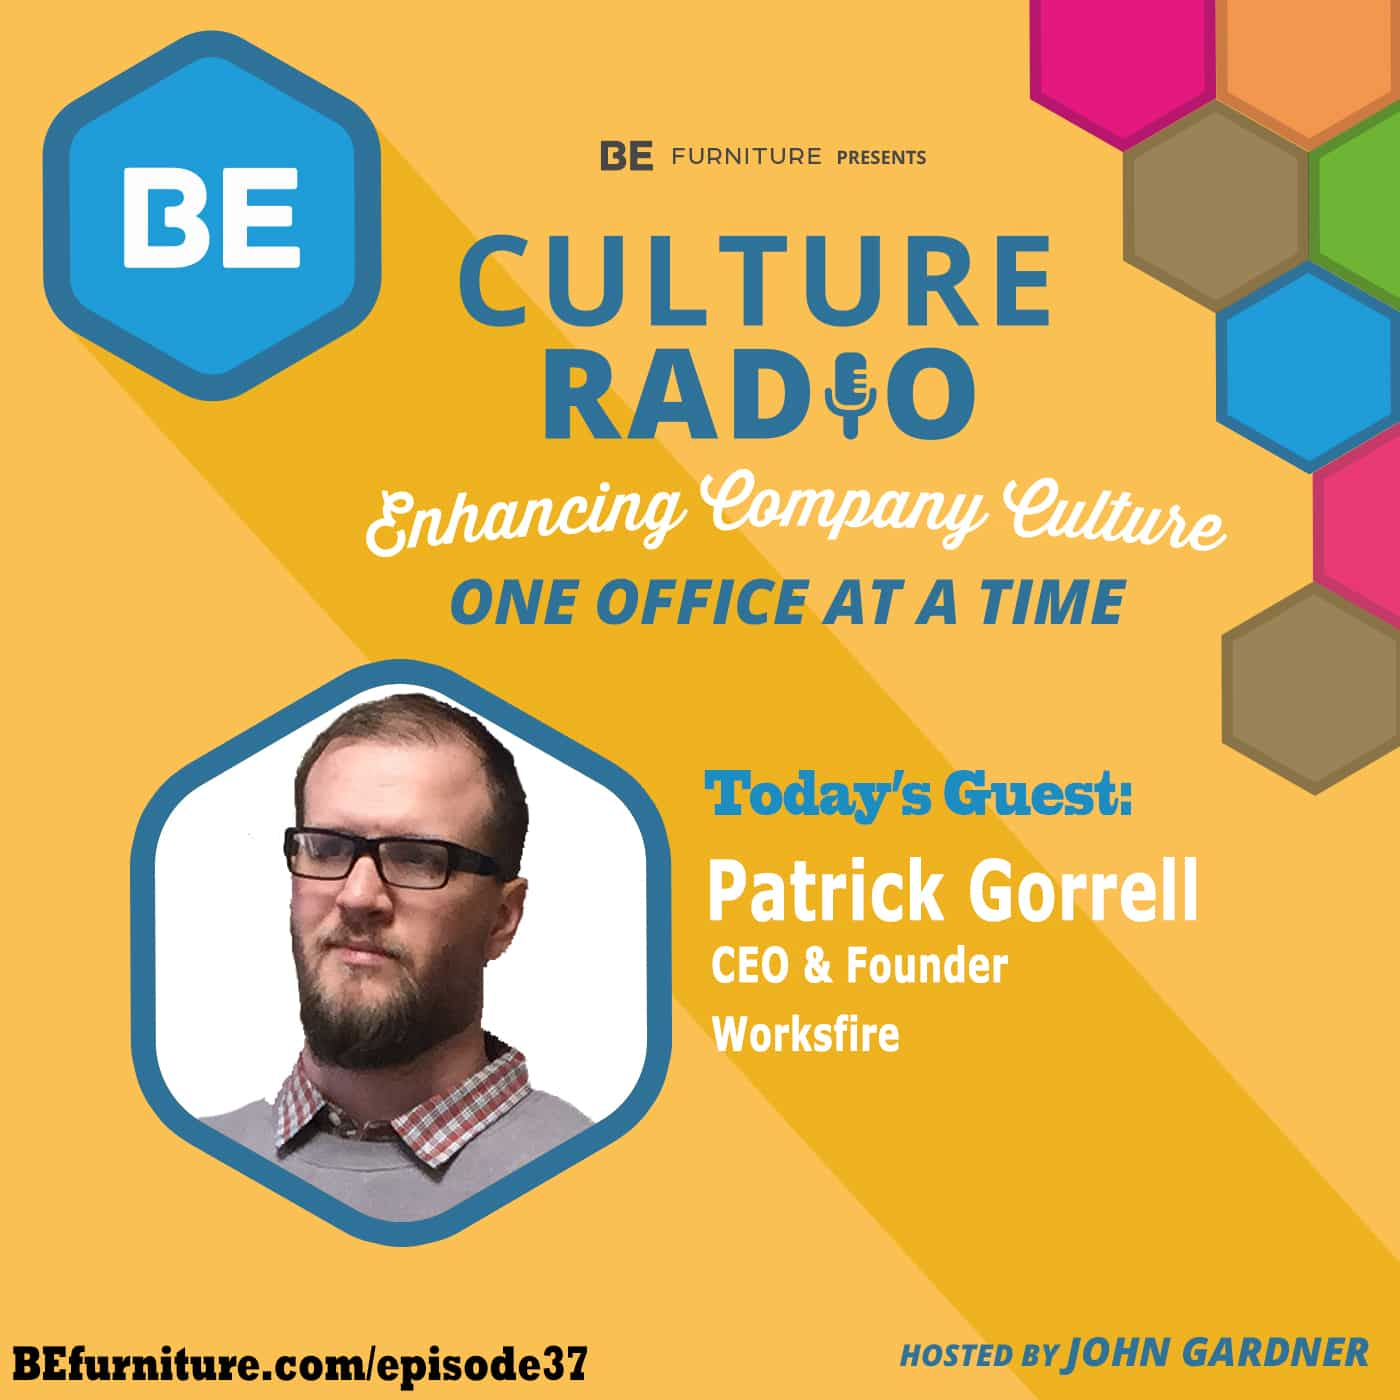 Patrick Gorrell - CEO, Worksfire